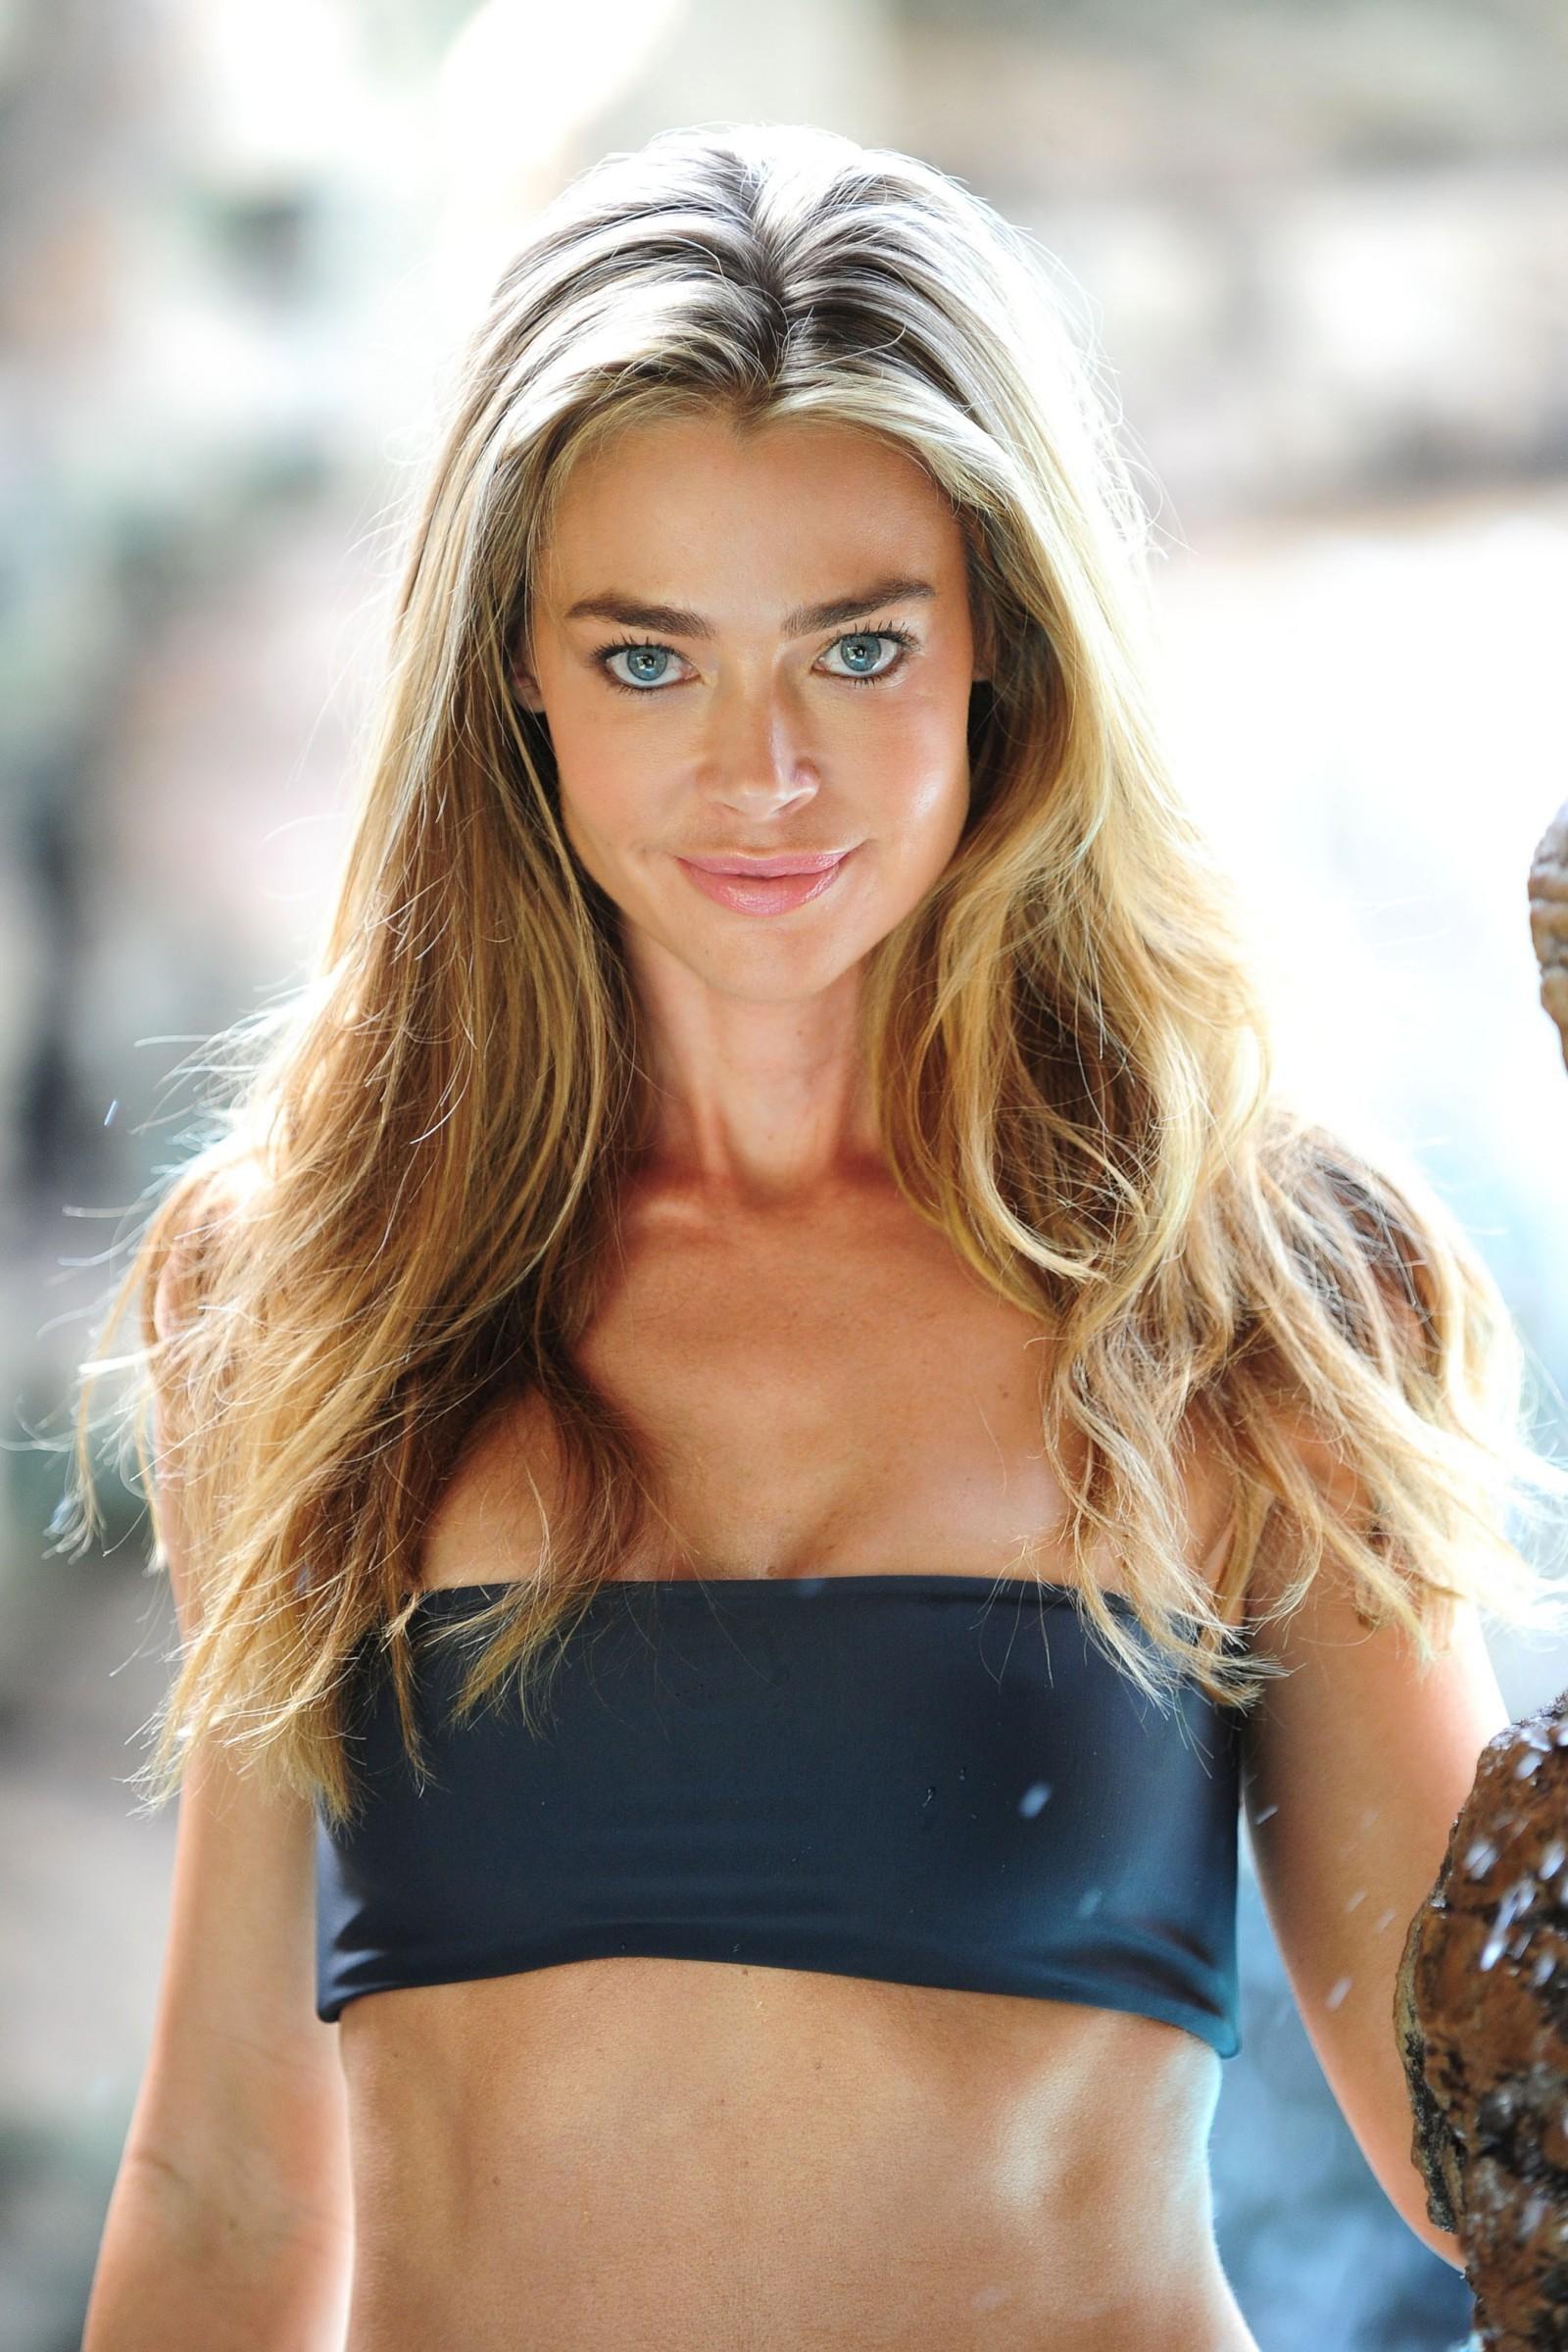 Denise Richards Desnuda Fotos Y Vídeos Imperiodefamosas